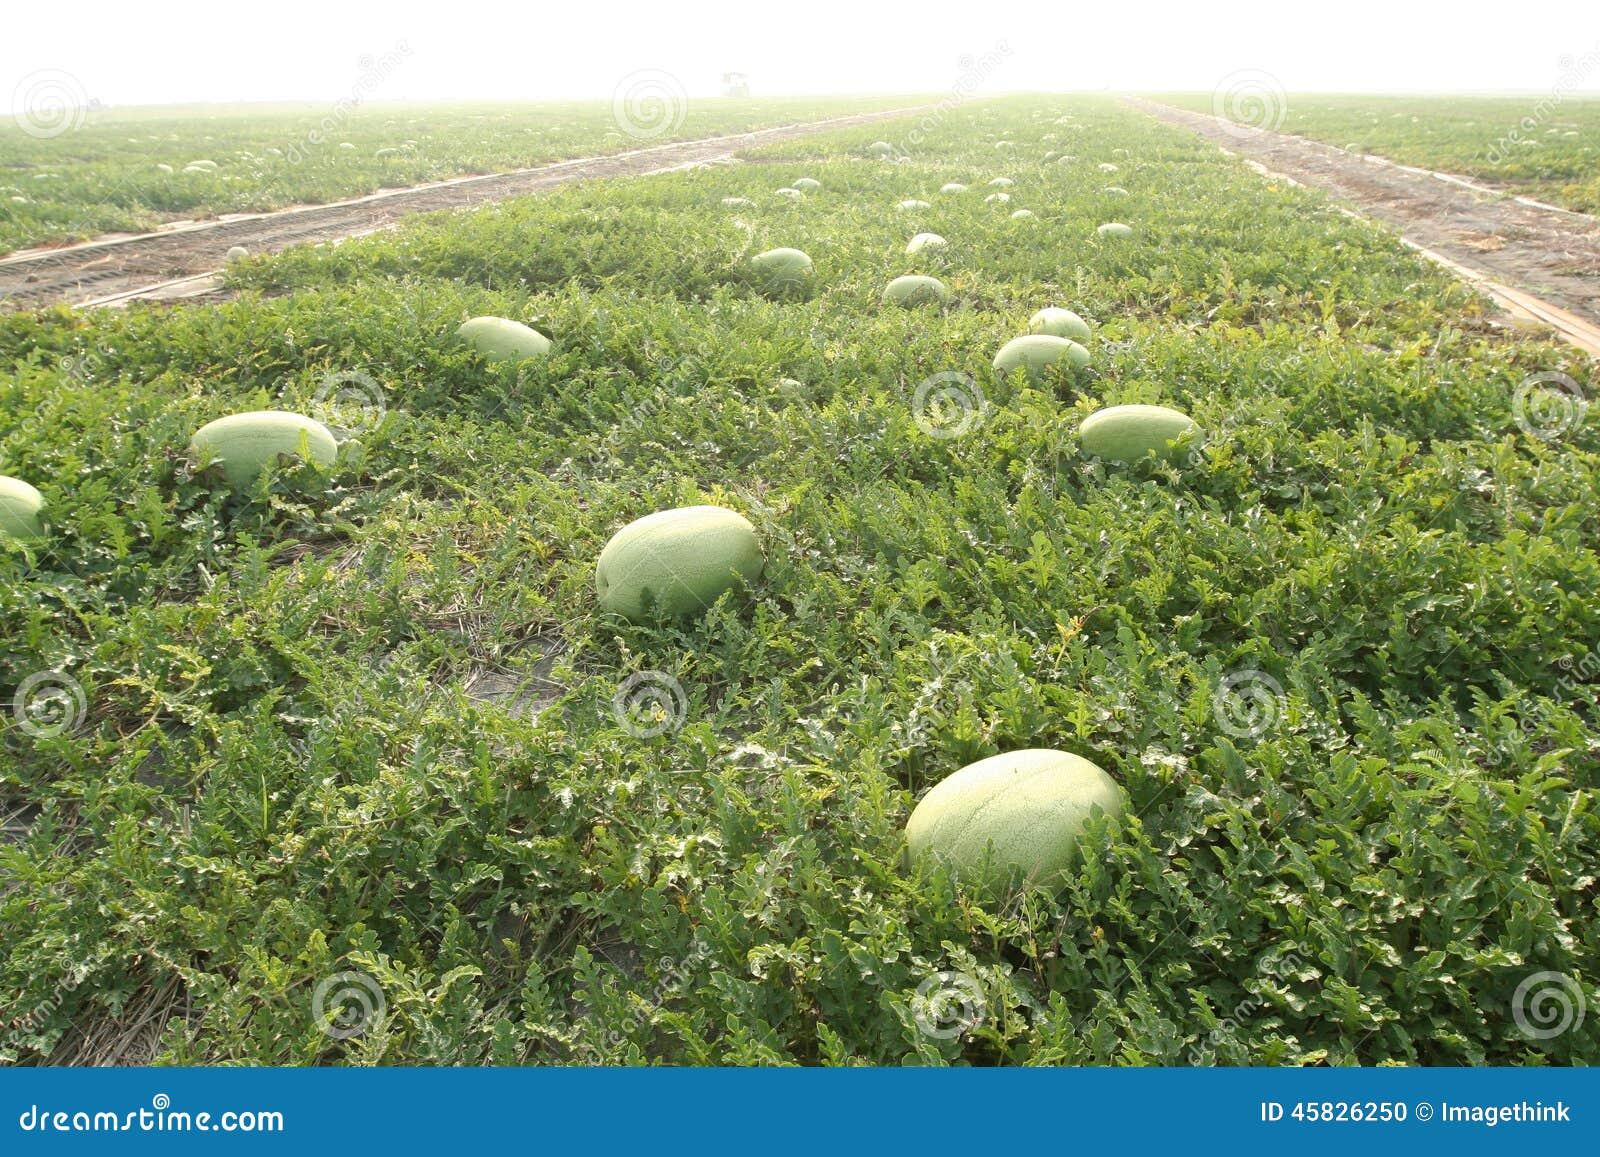 economic importance of watermelon